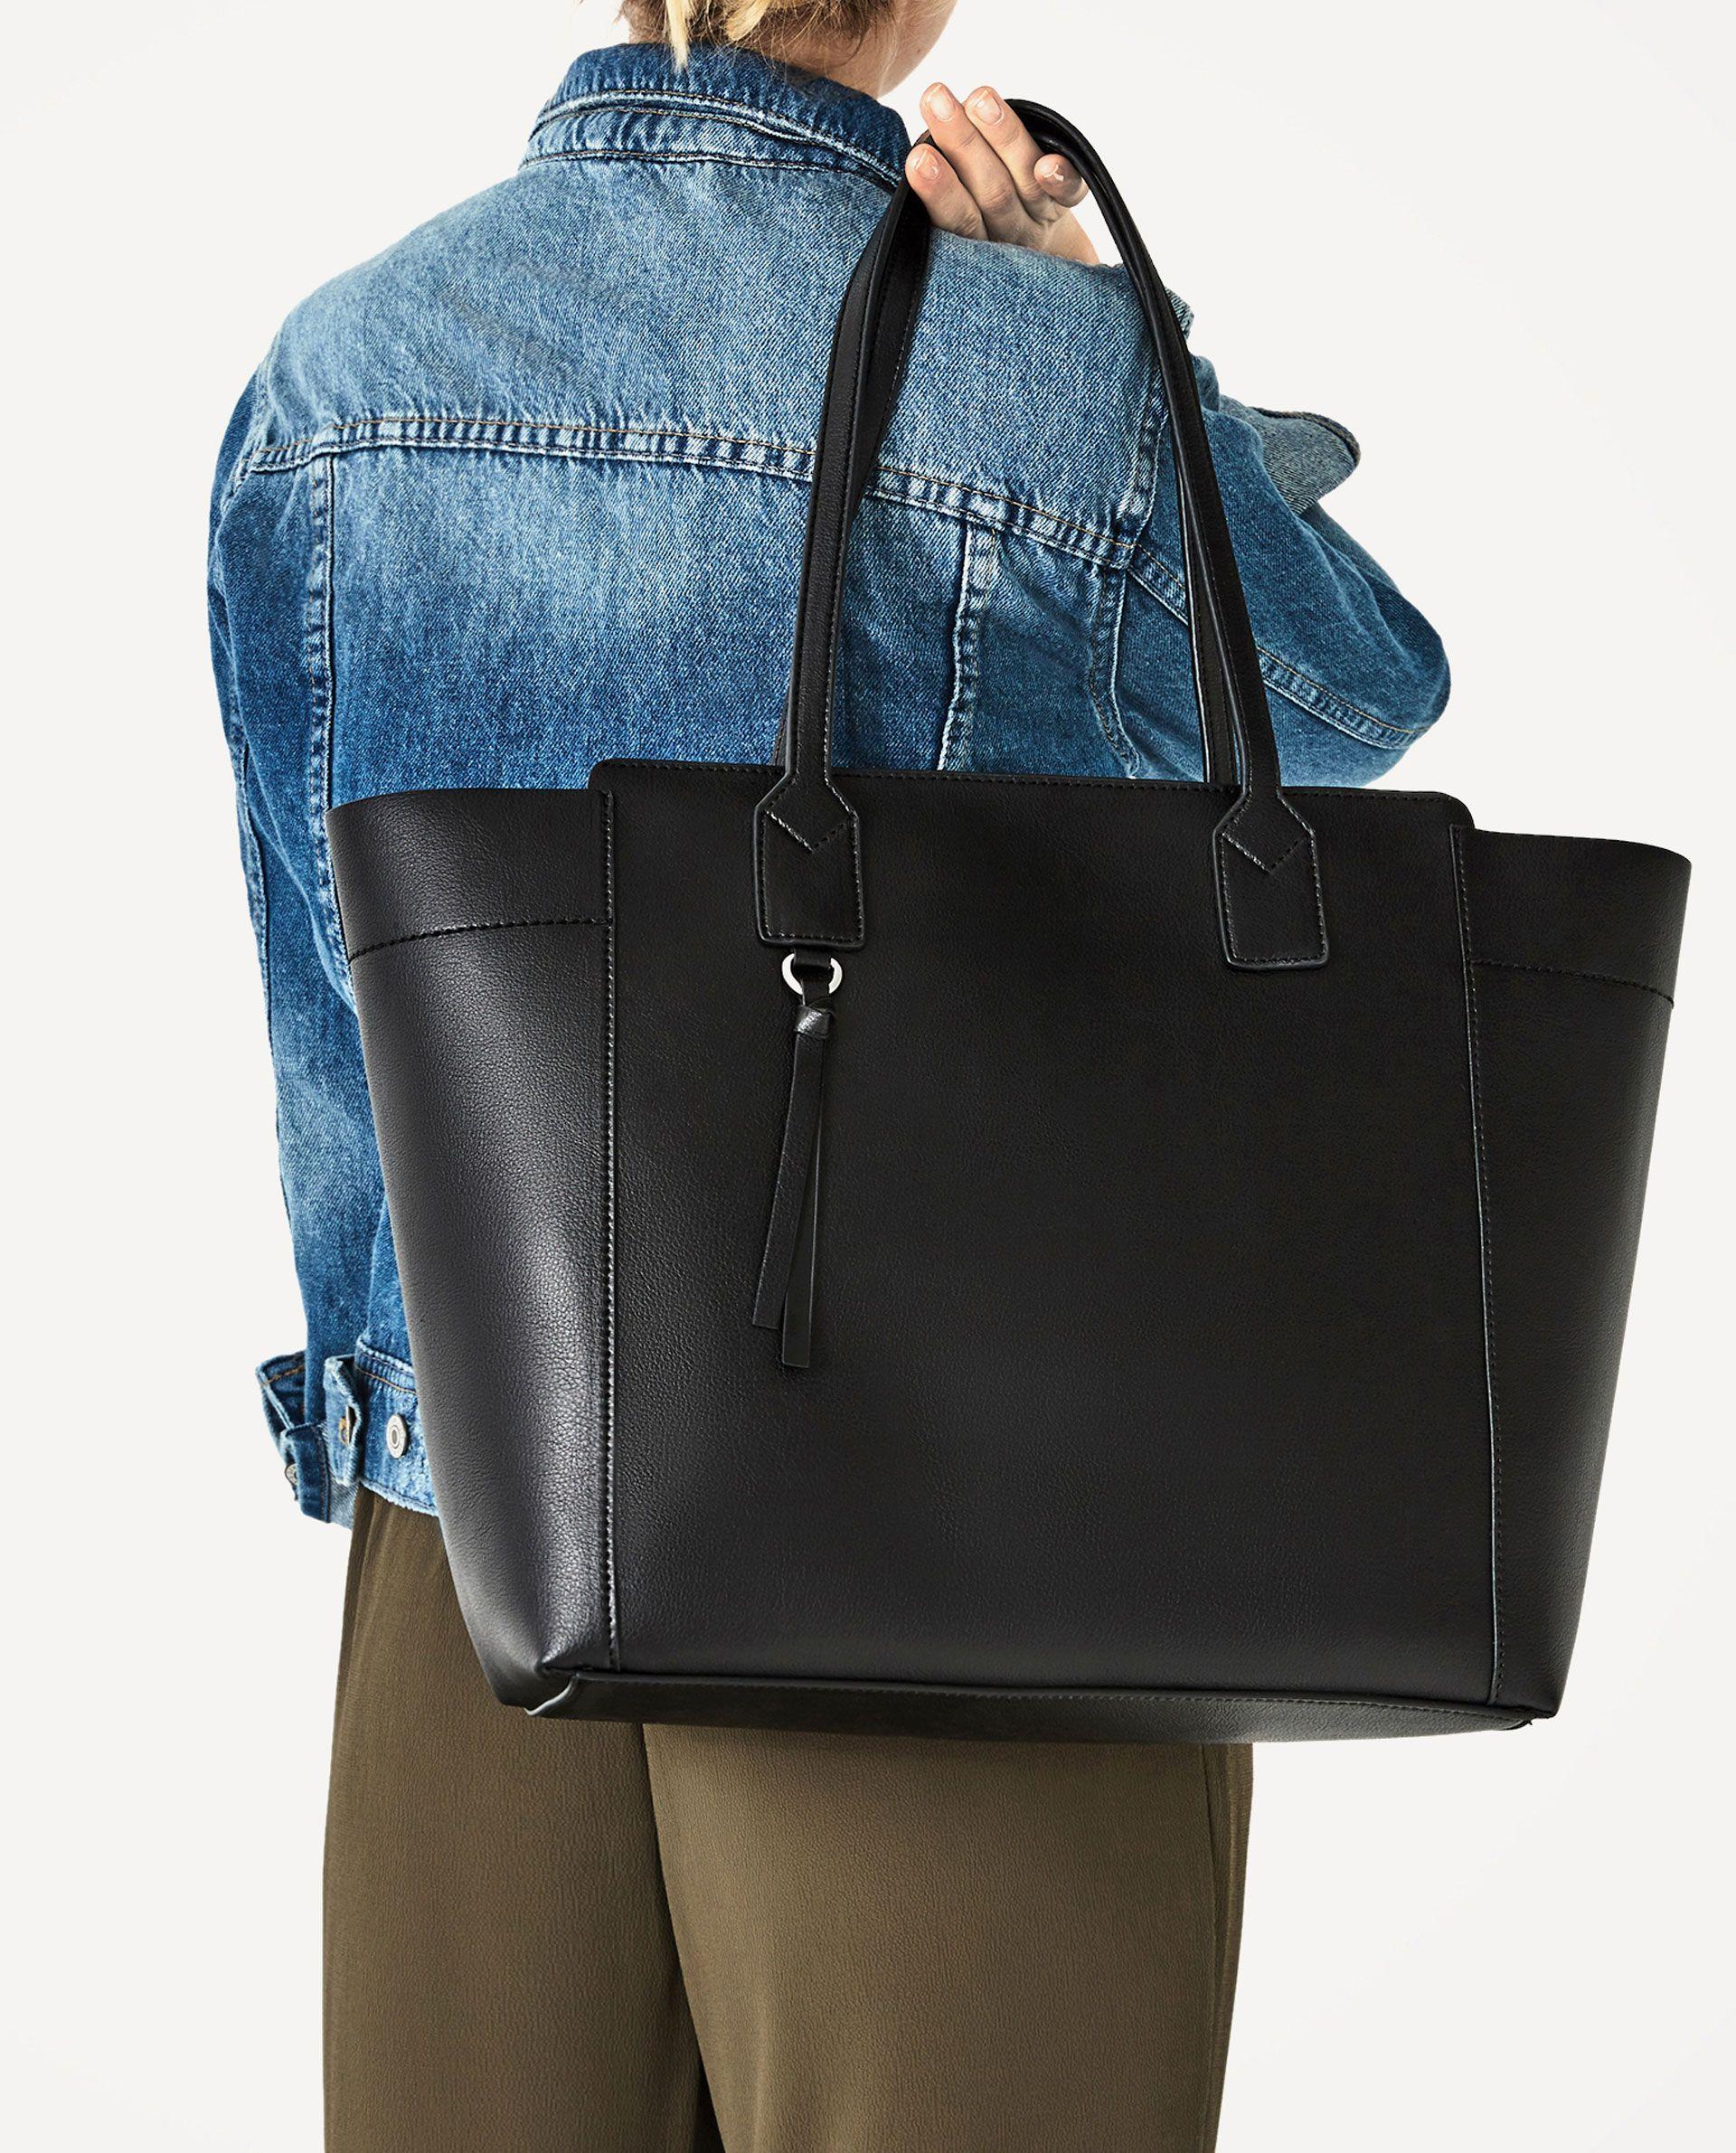 5fa79a49a Image 1 of ZIP-UP TOTE from Zara | estilo | Zara tote bags, Zara ...